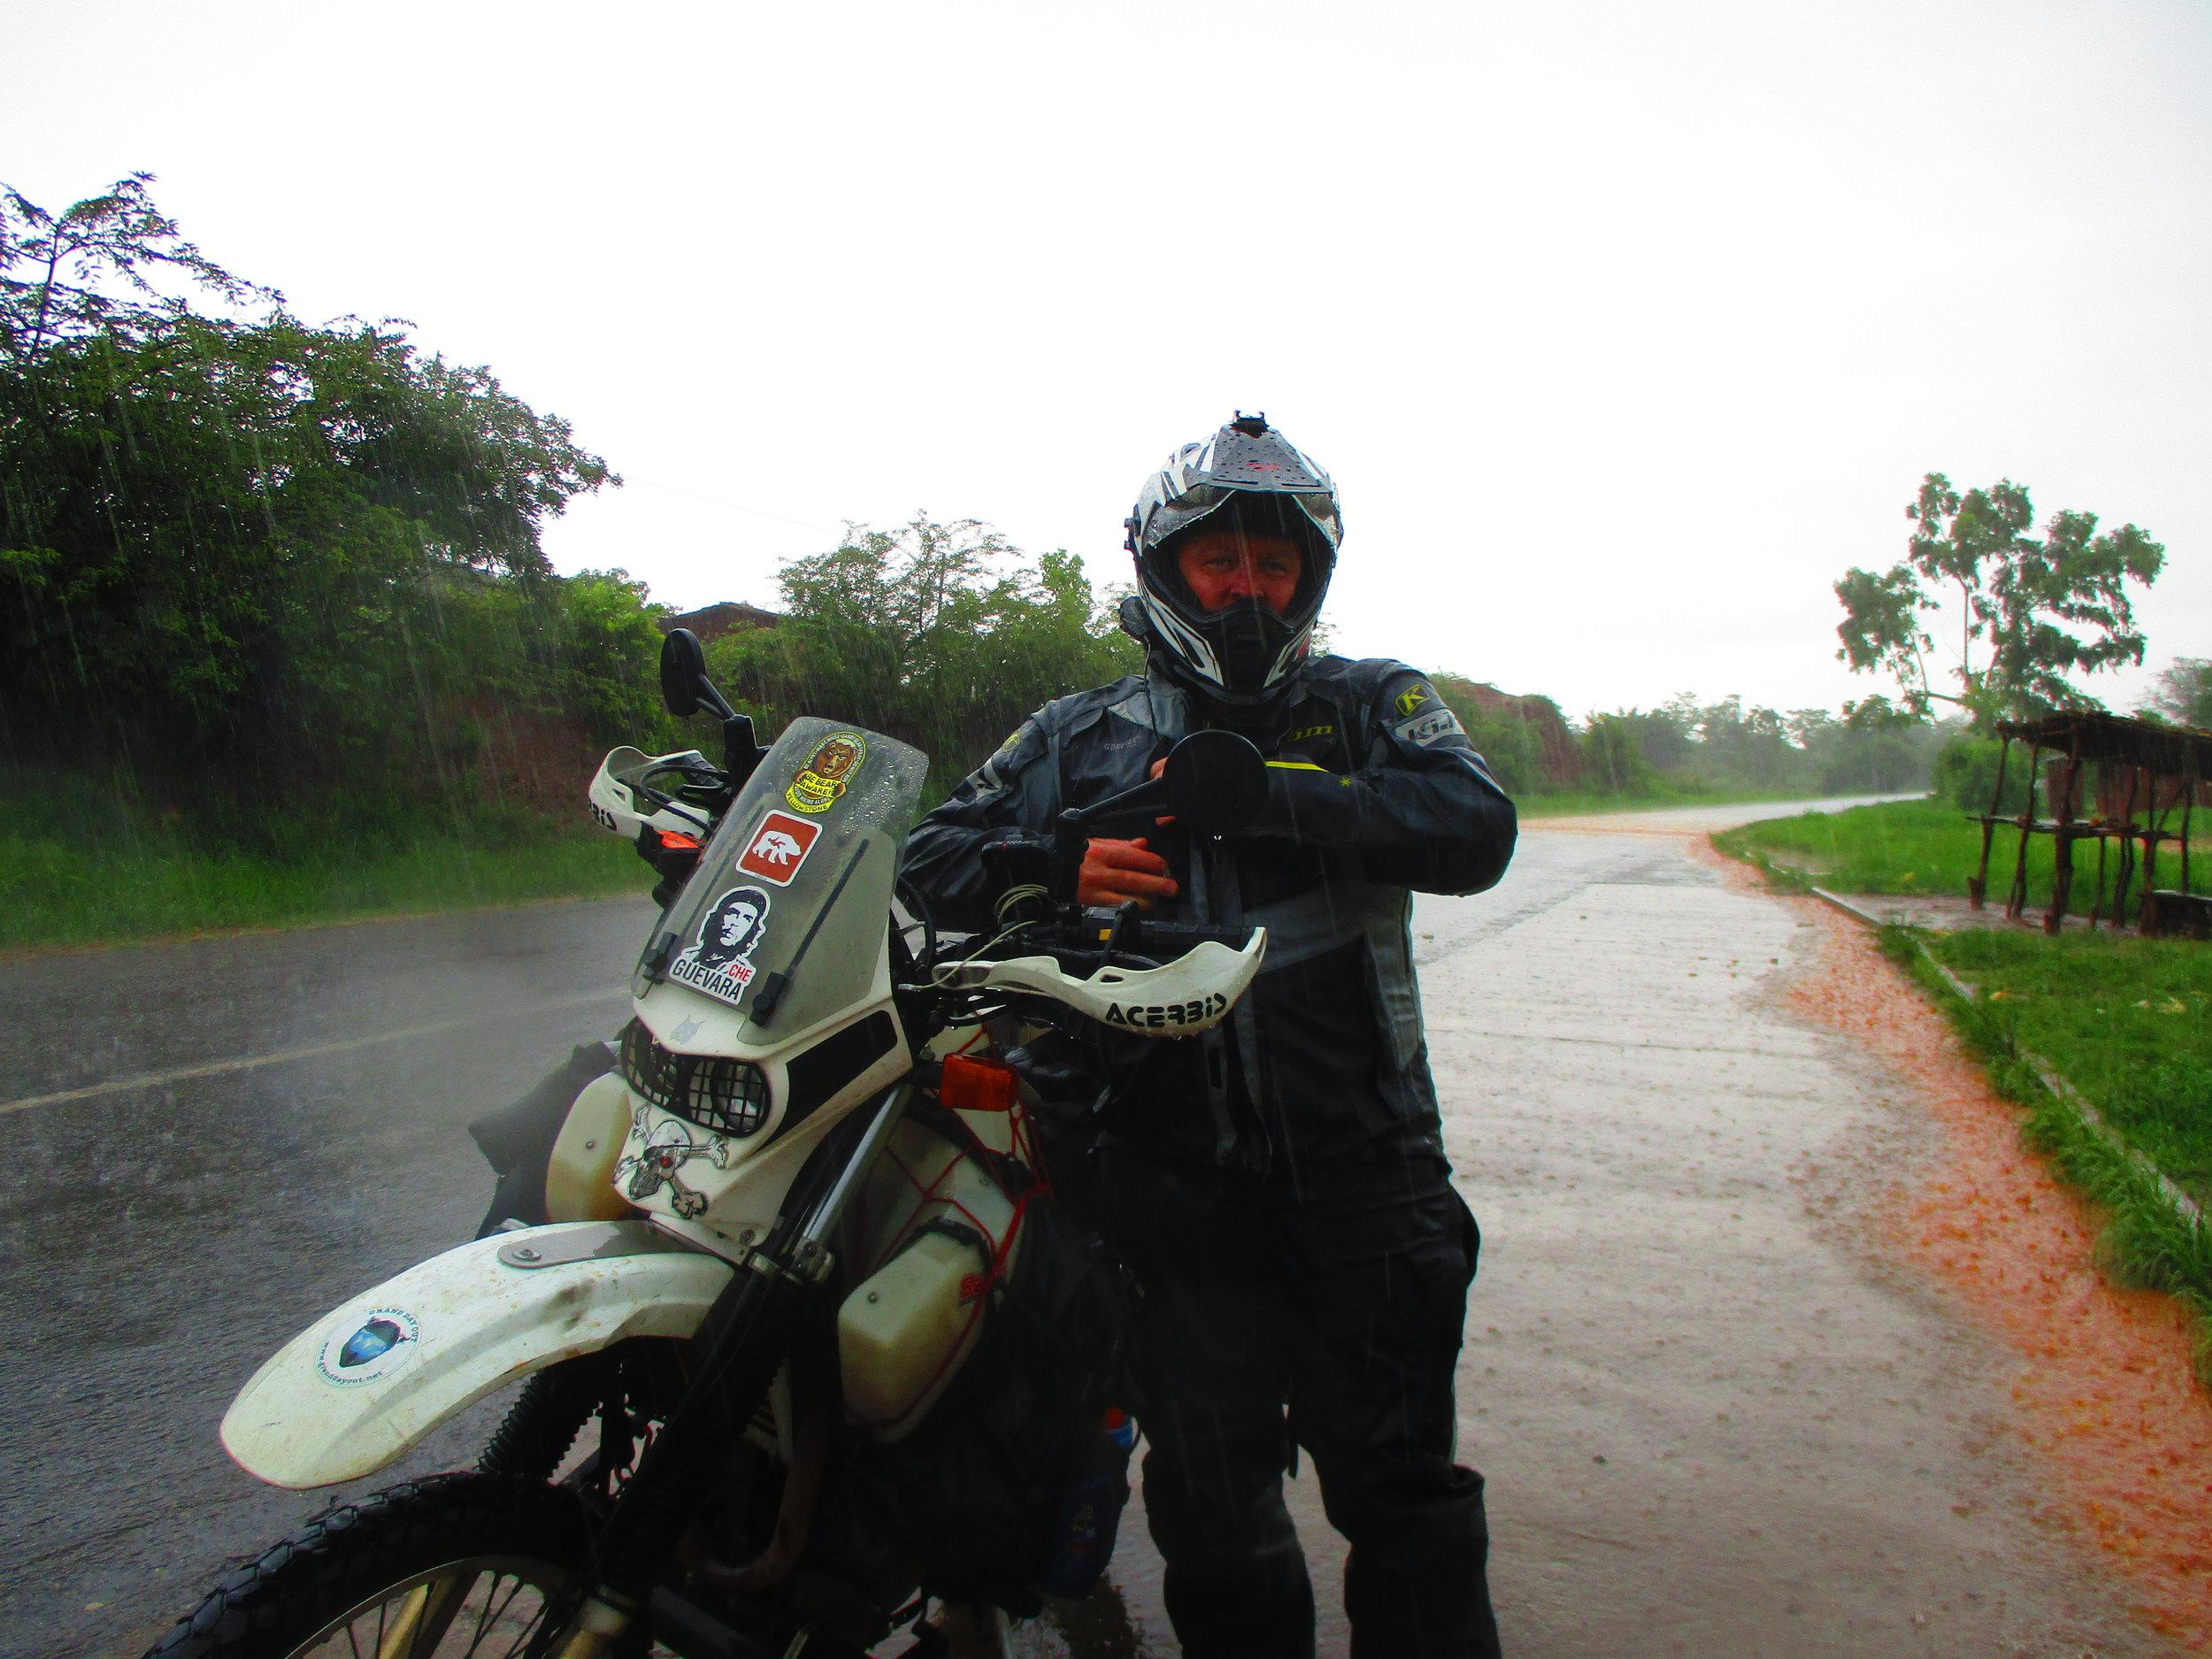 The rain hits